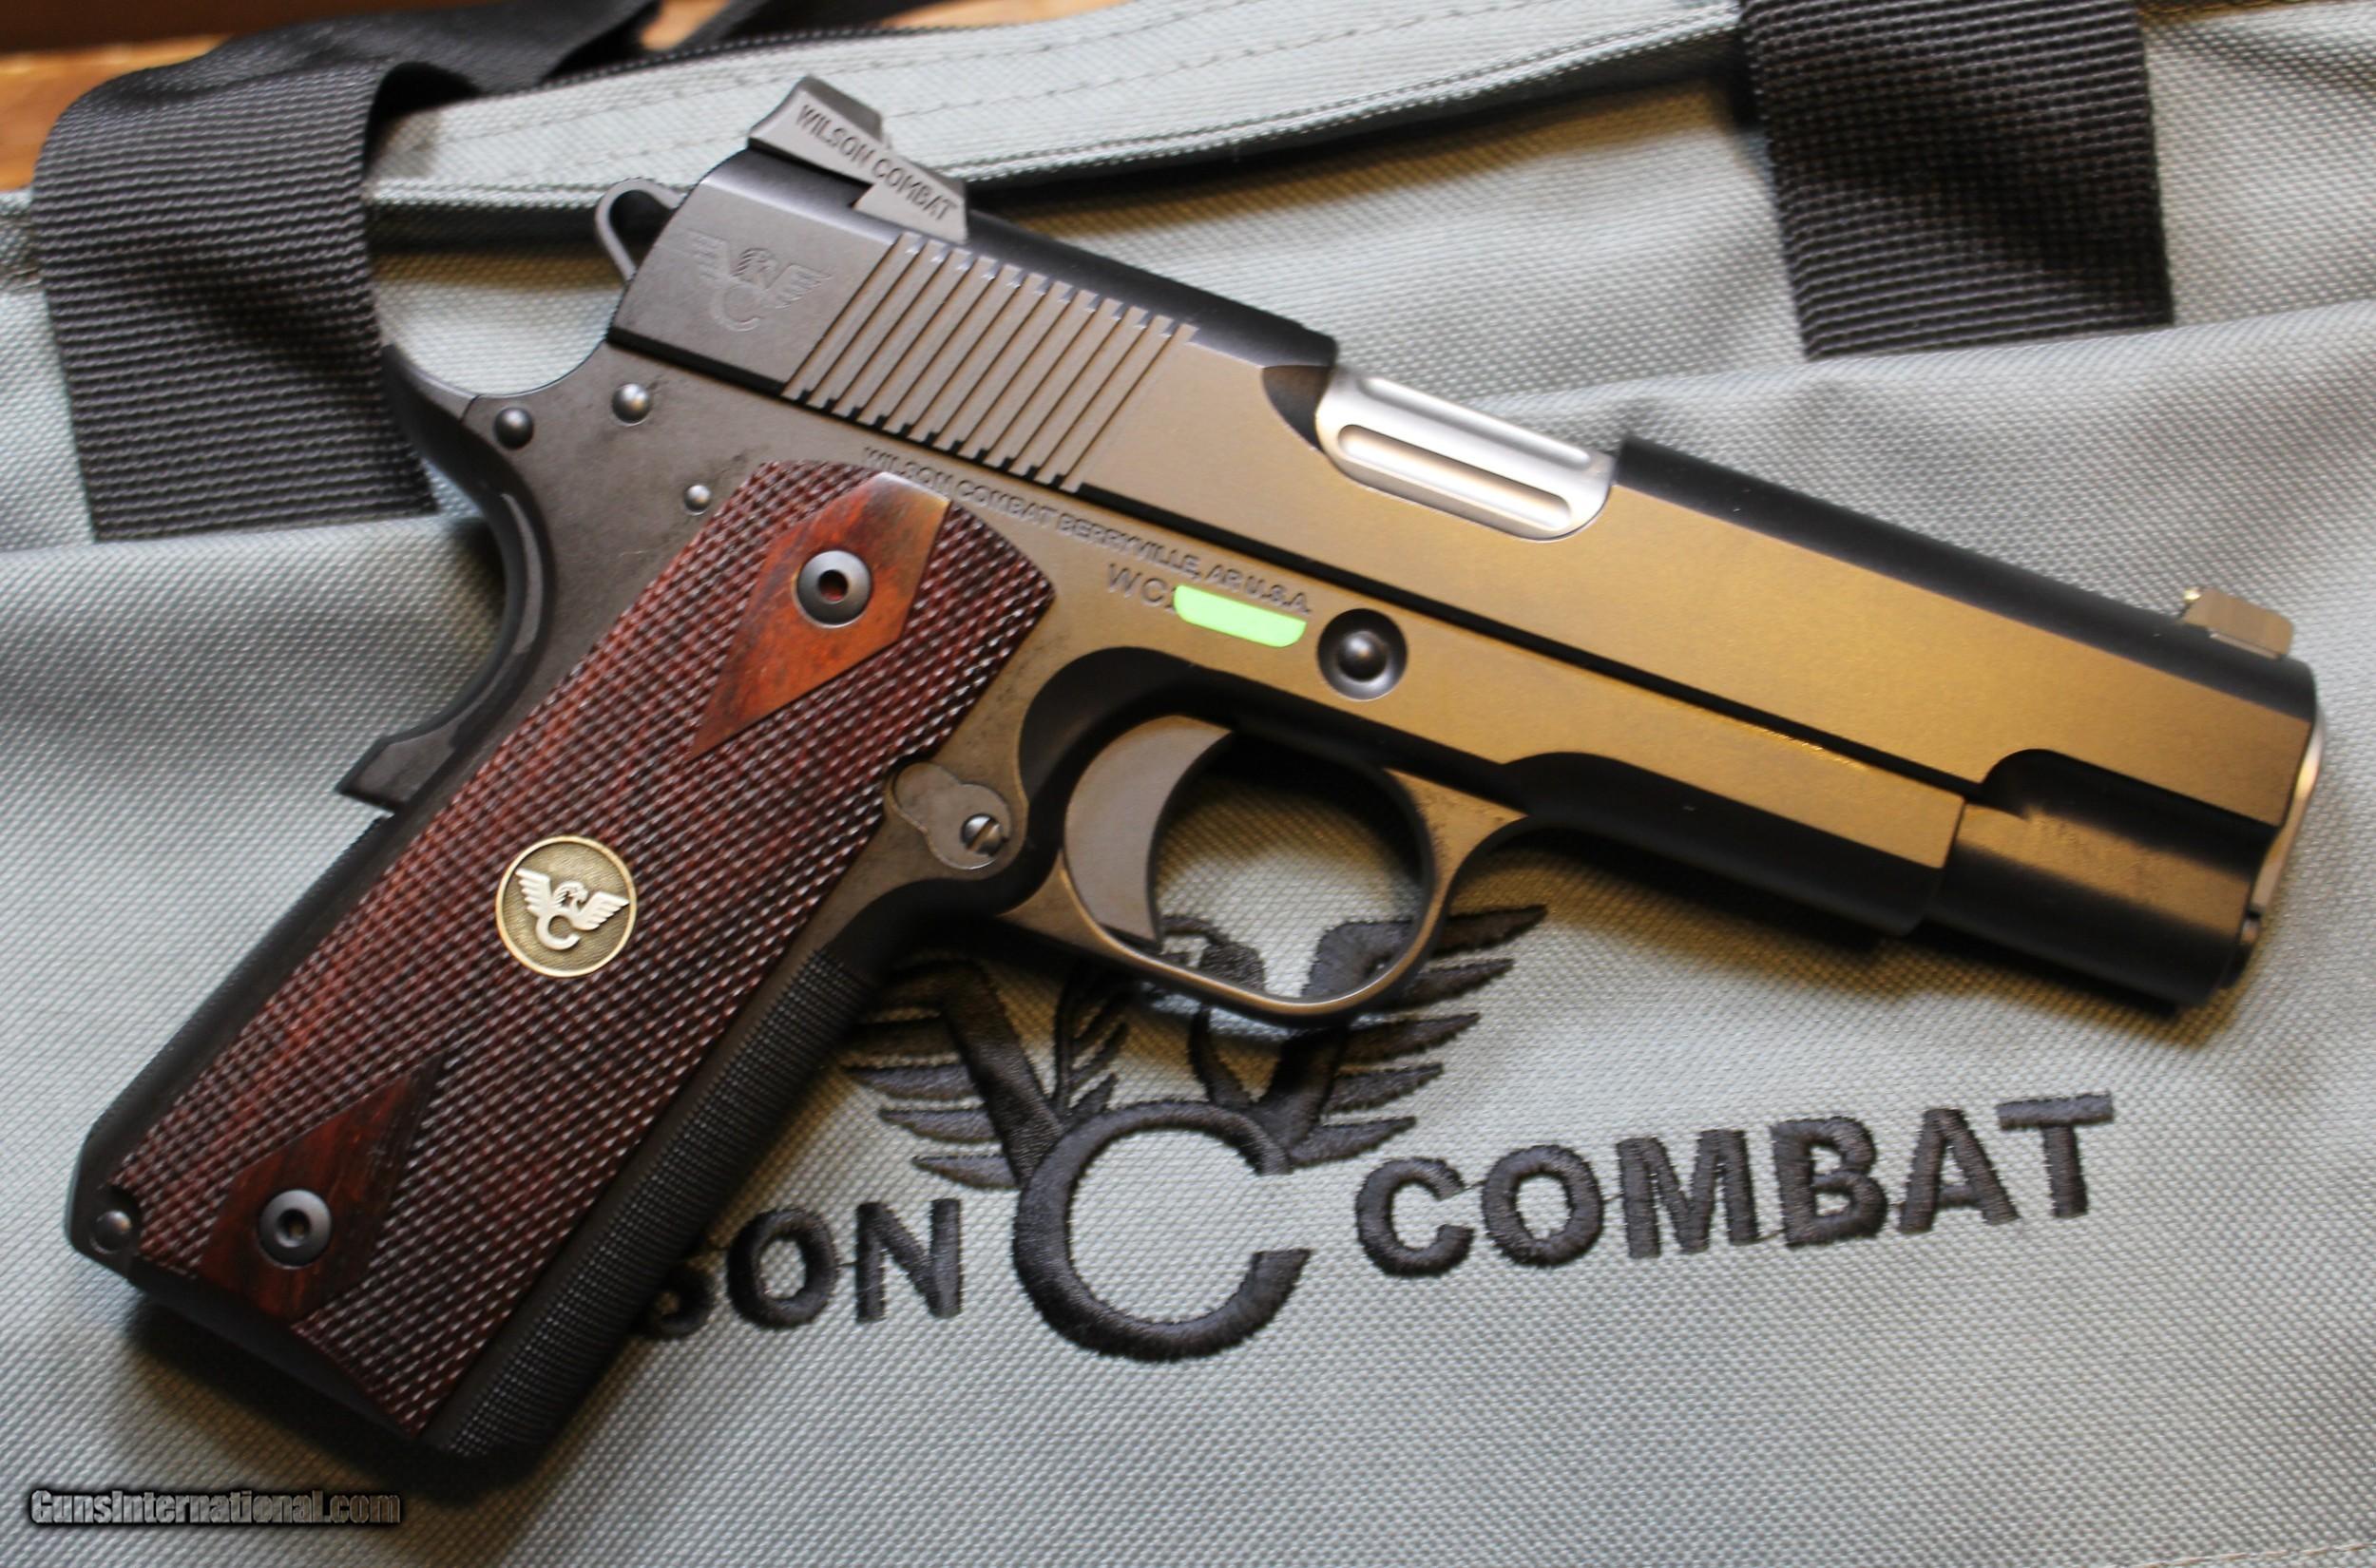 Wilson Combat CQB Commander 1911 45ACP with upgrades